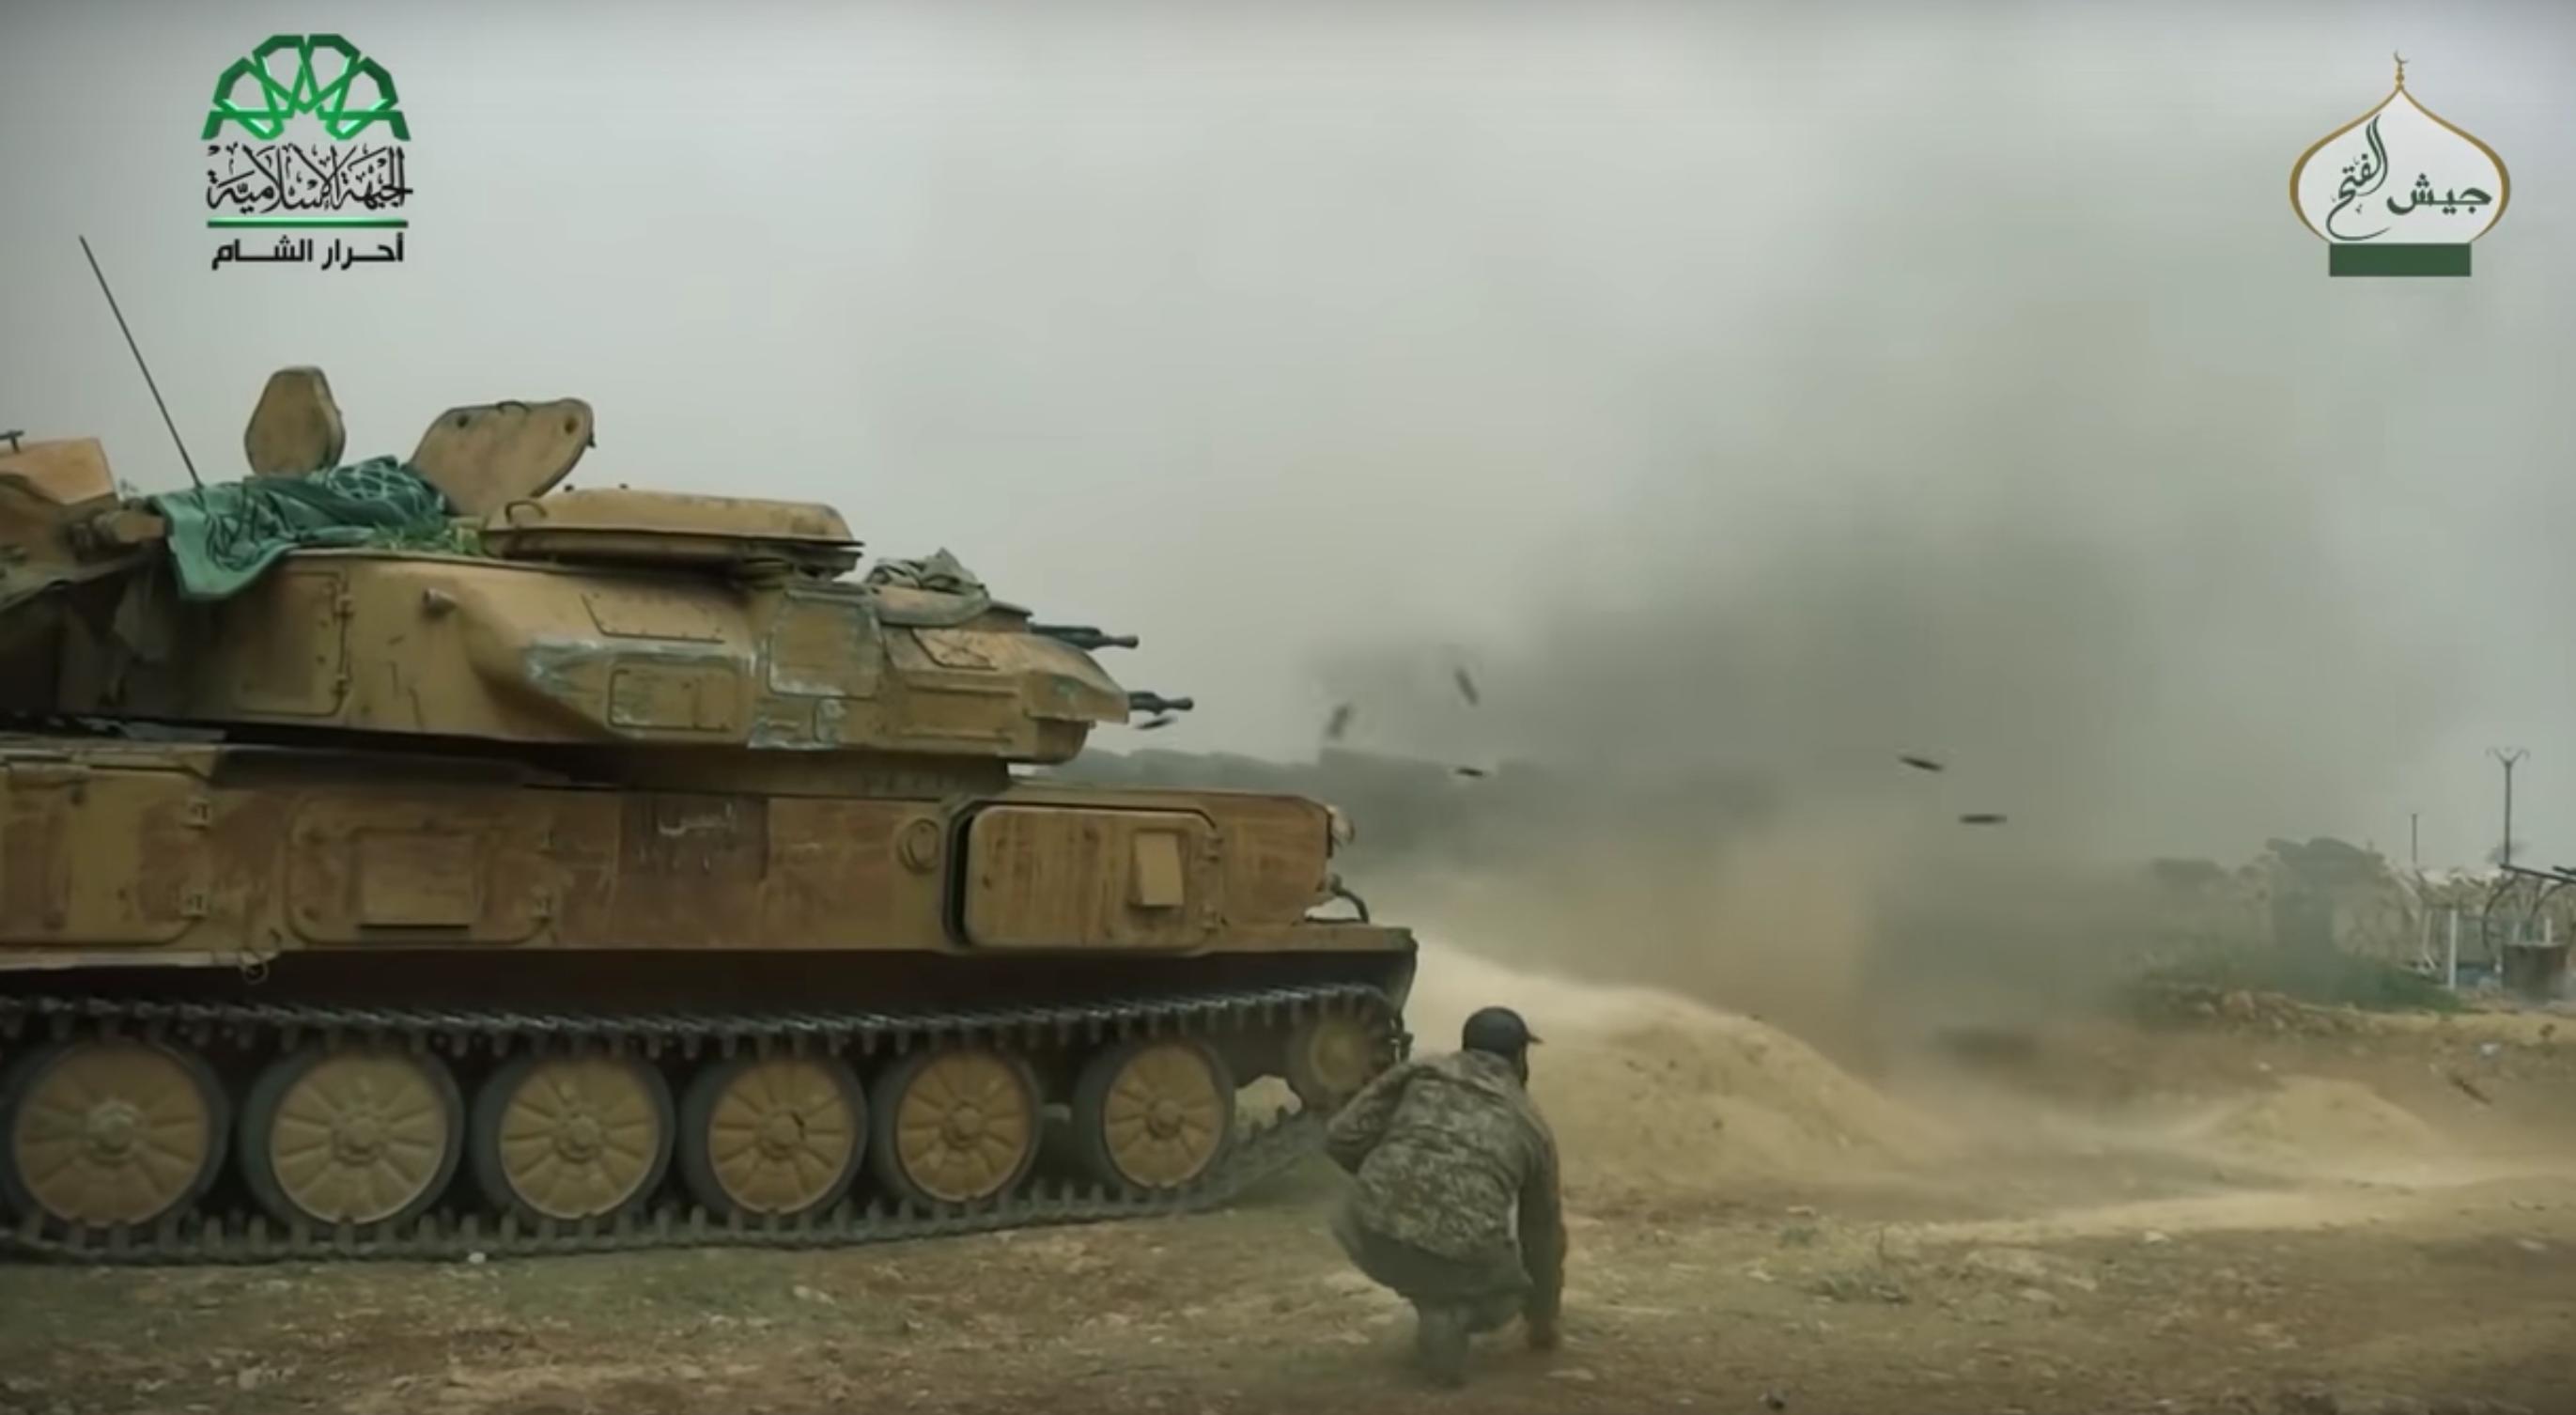 Youtube / War Clashes